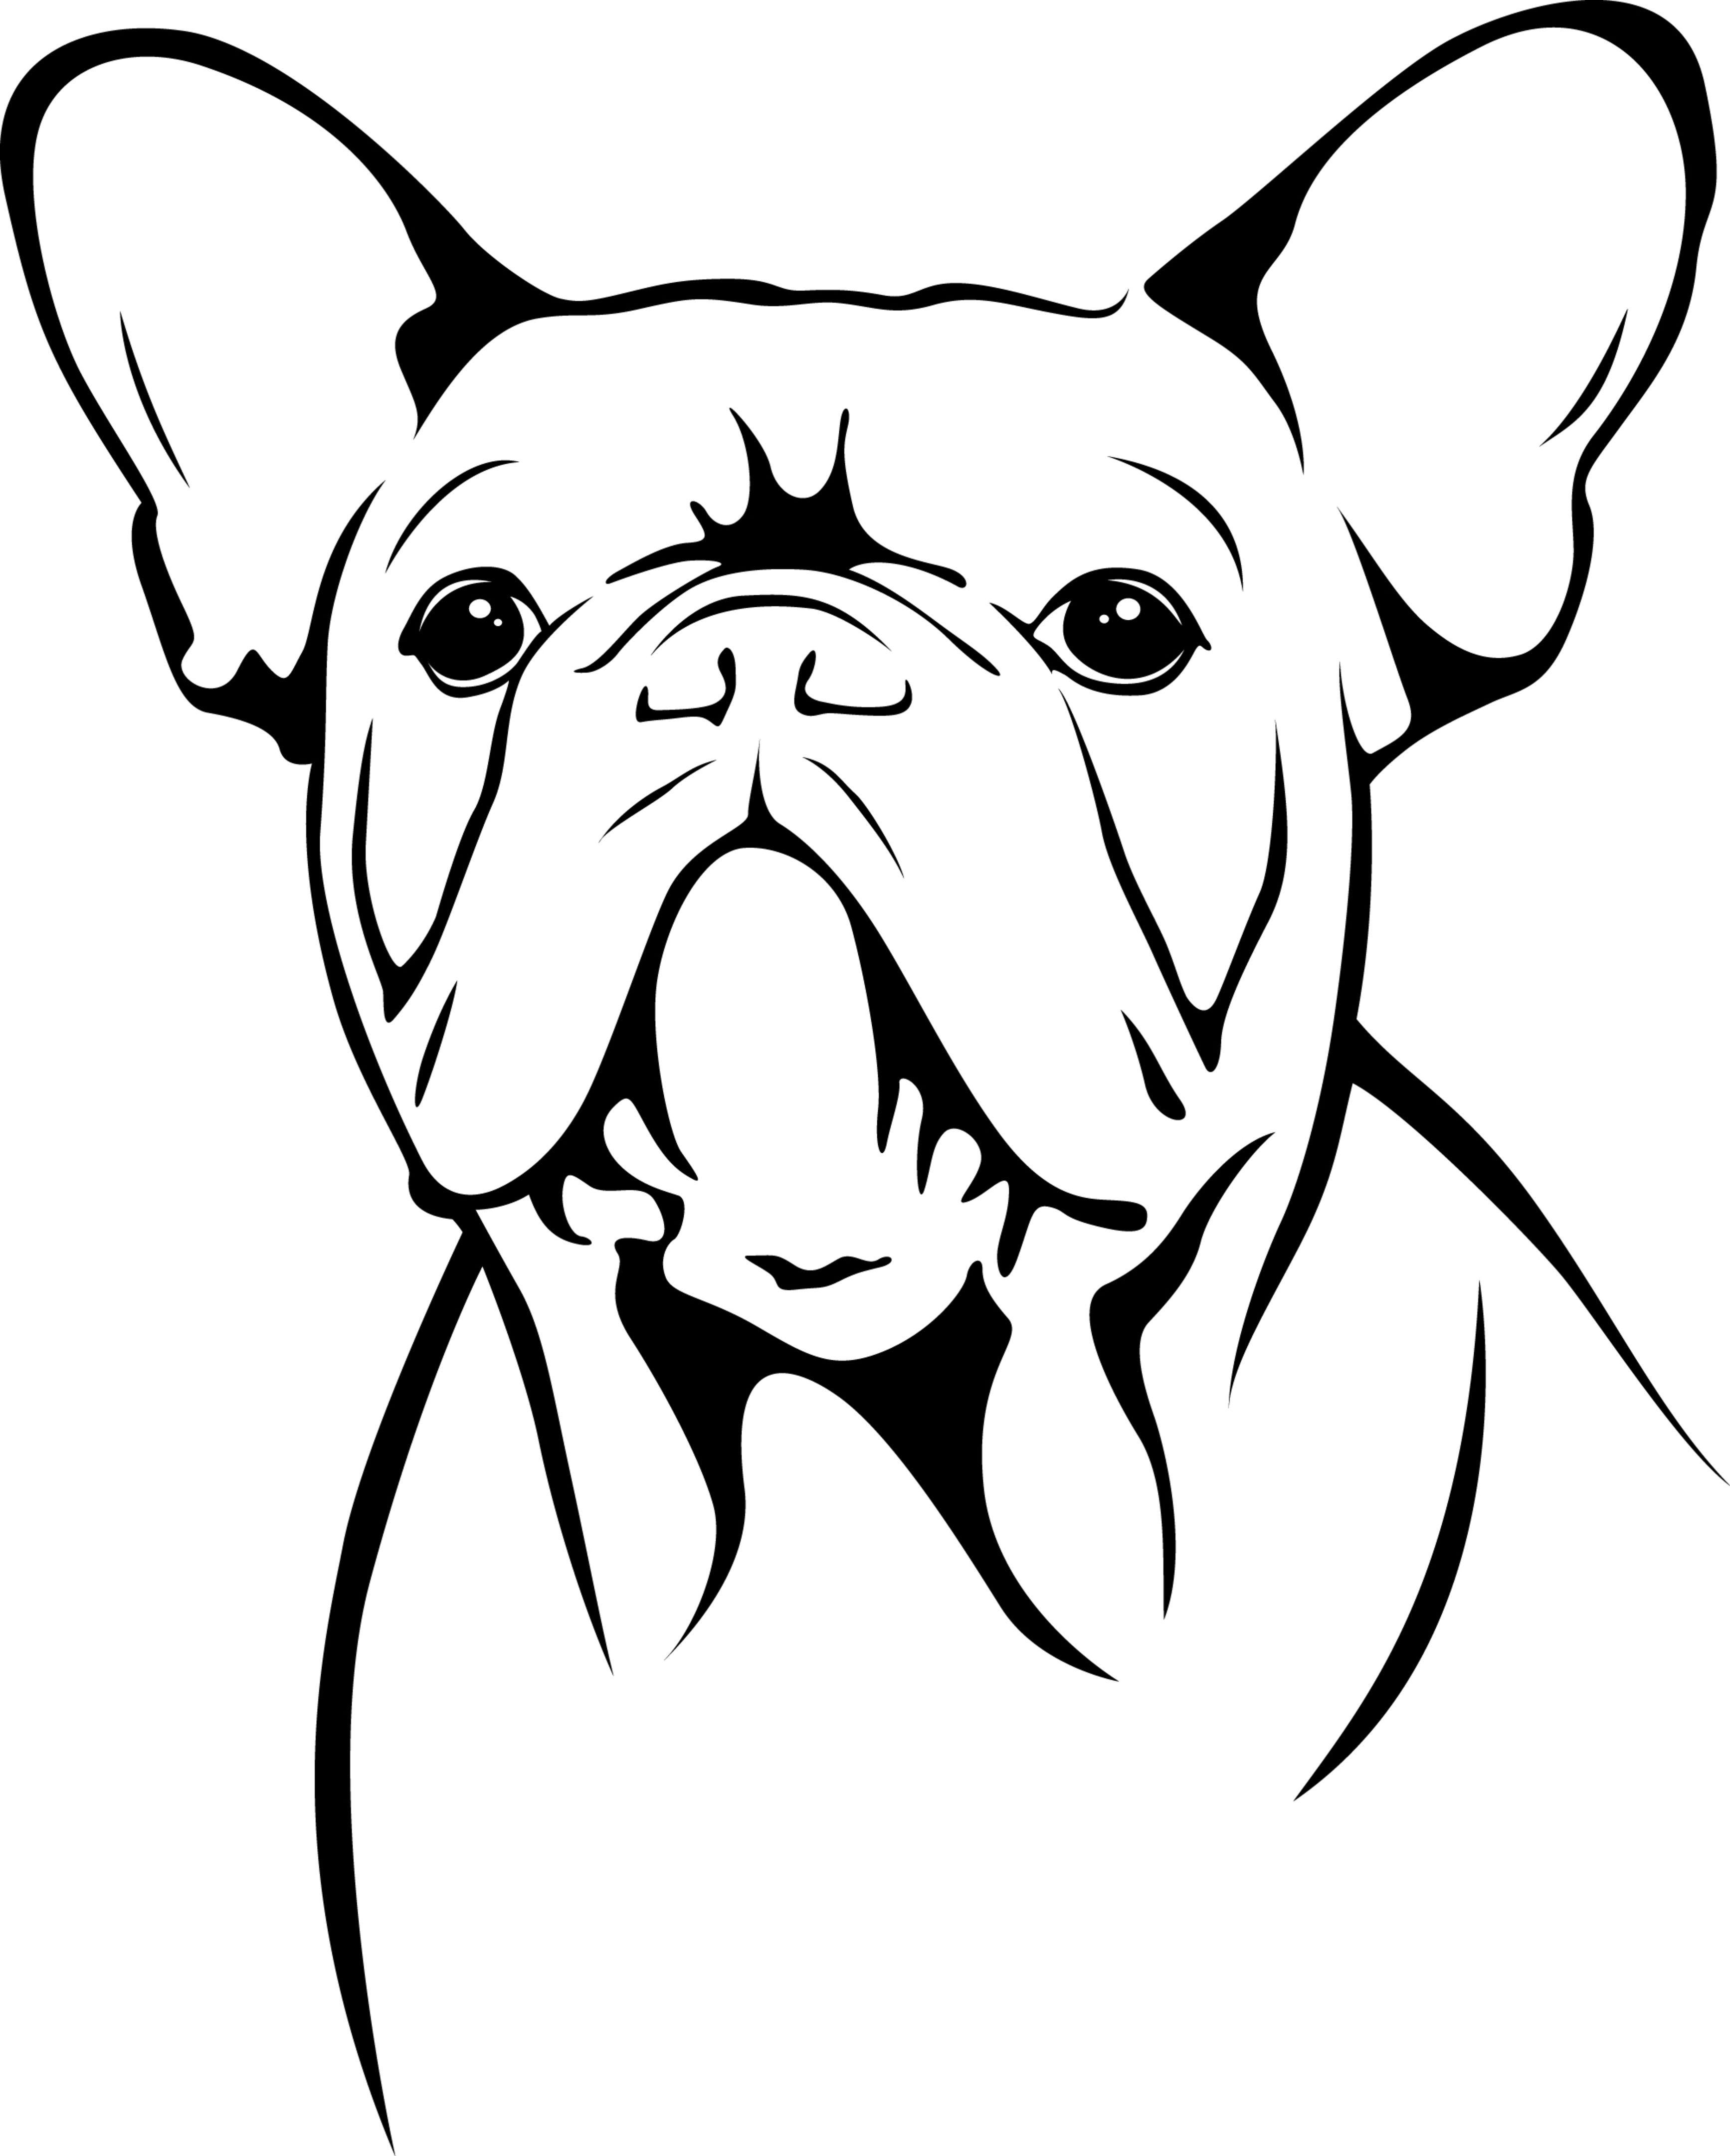 7 Pics of French Bulldog Coloring Pages French Bulldog